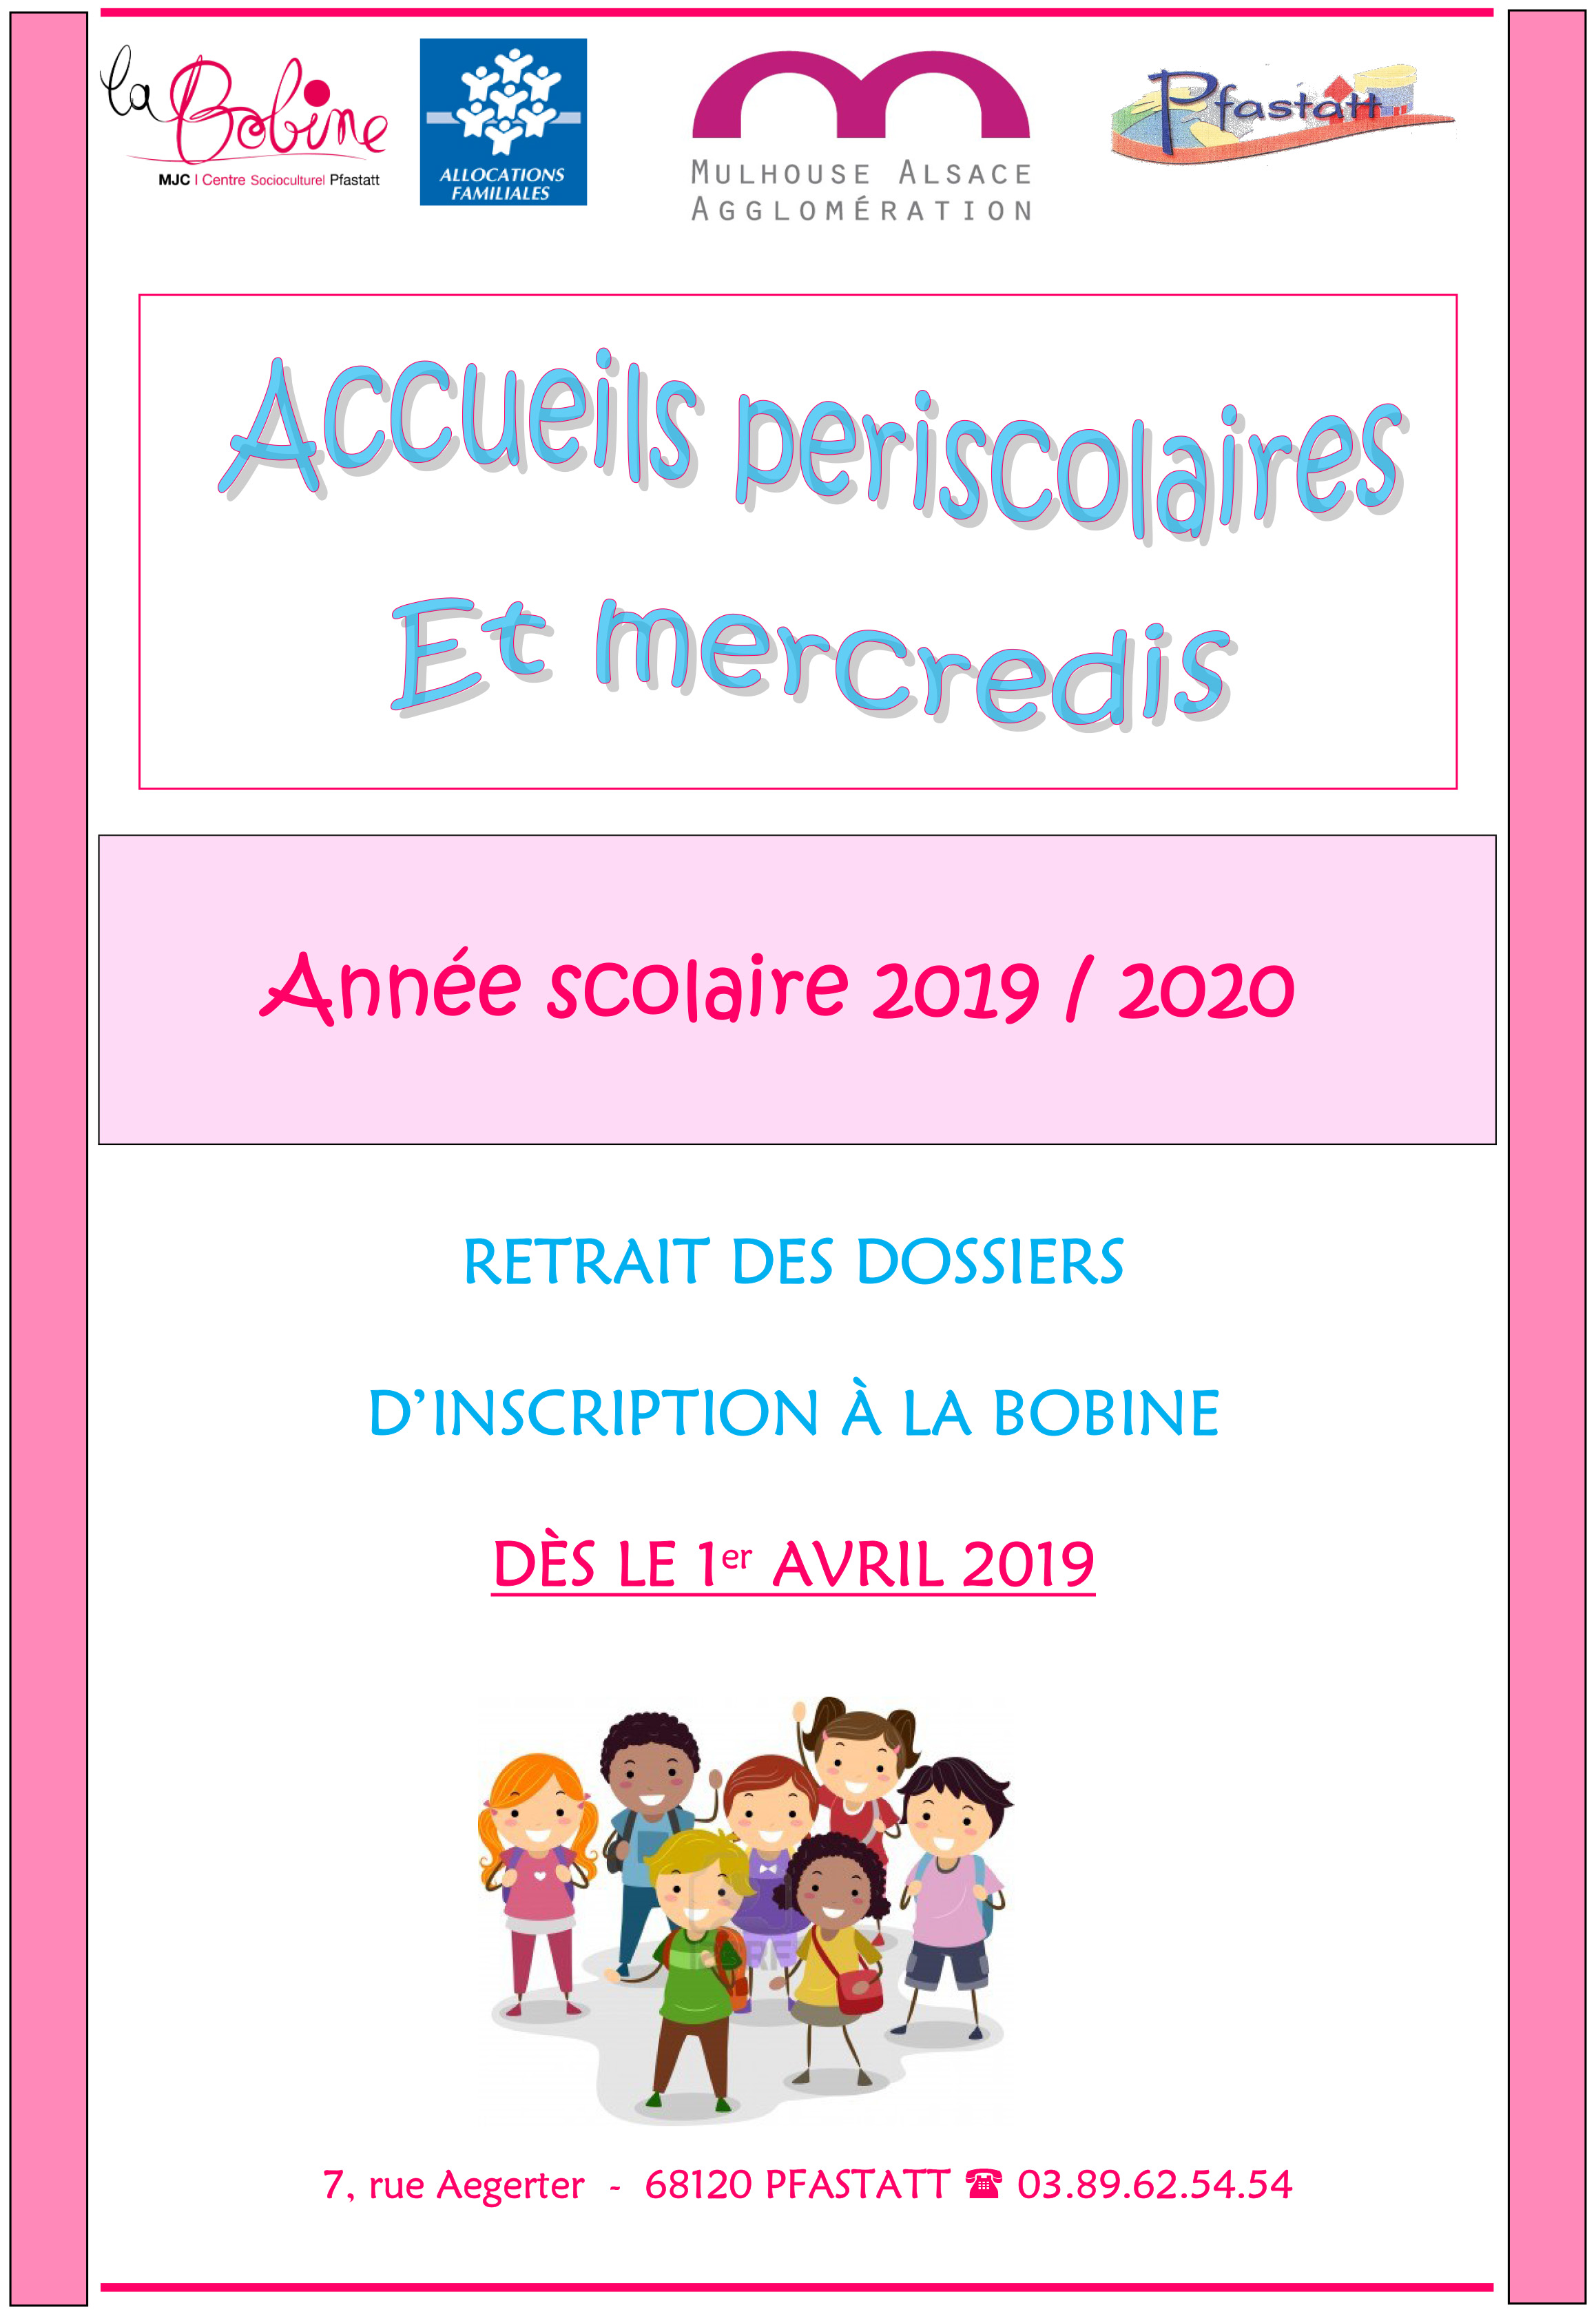 Microsoft Word - AFFICHE inscriptions periscolaire + LDM 2019 20